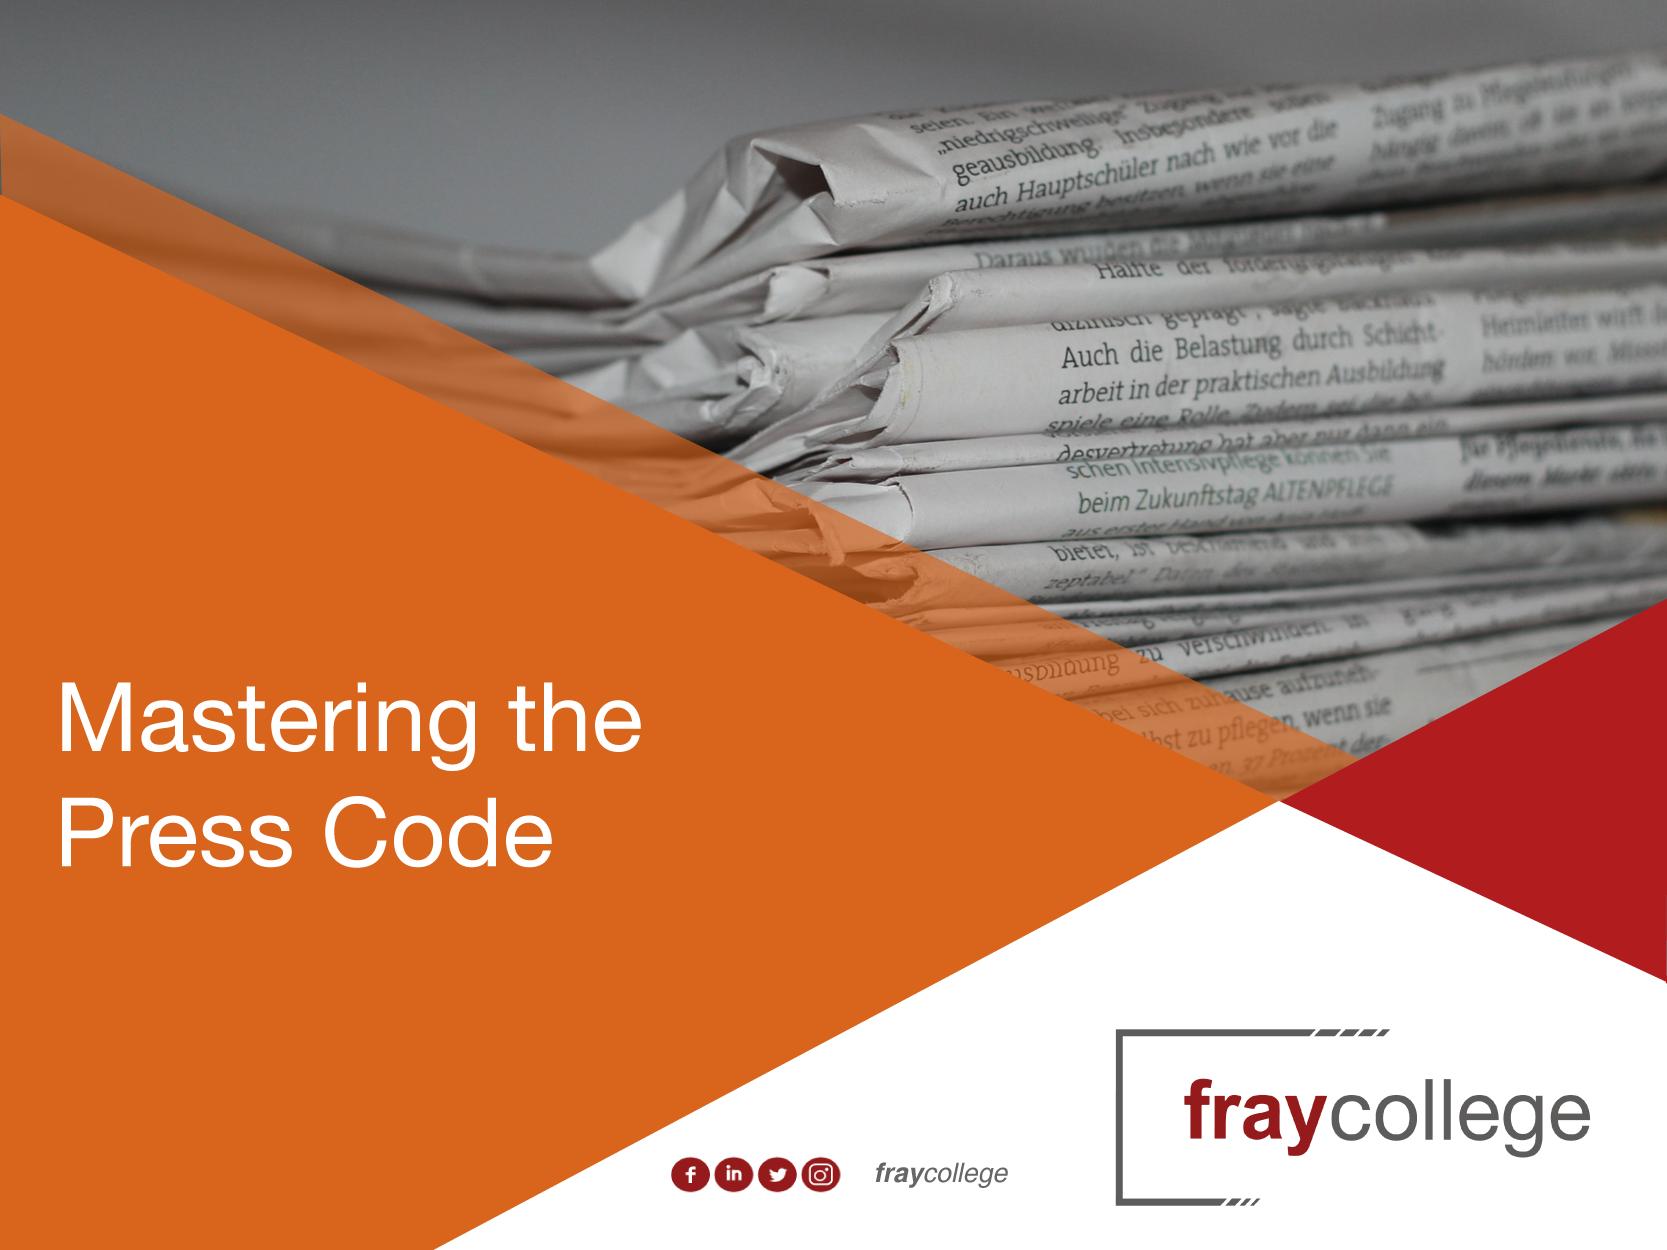 Mastering the Press Code